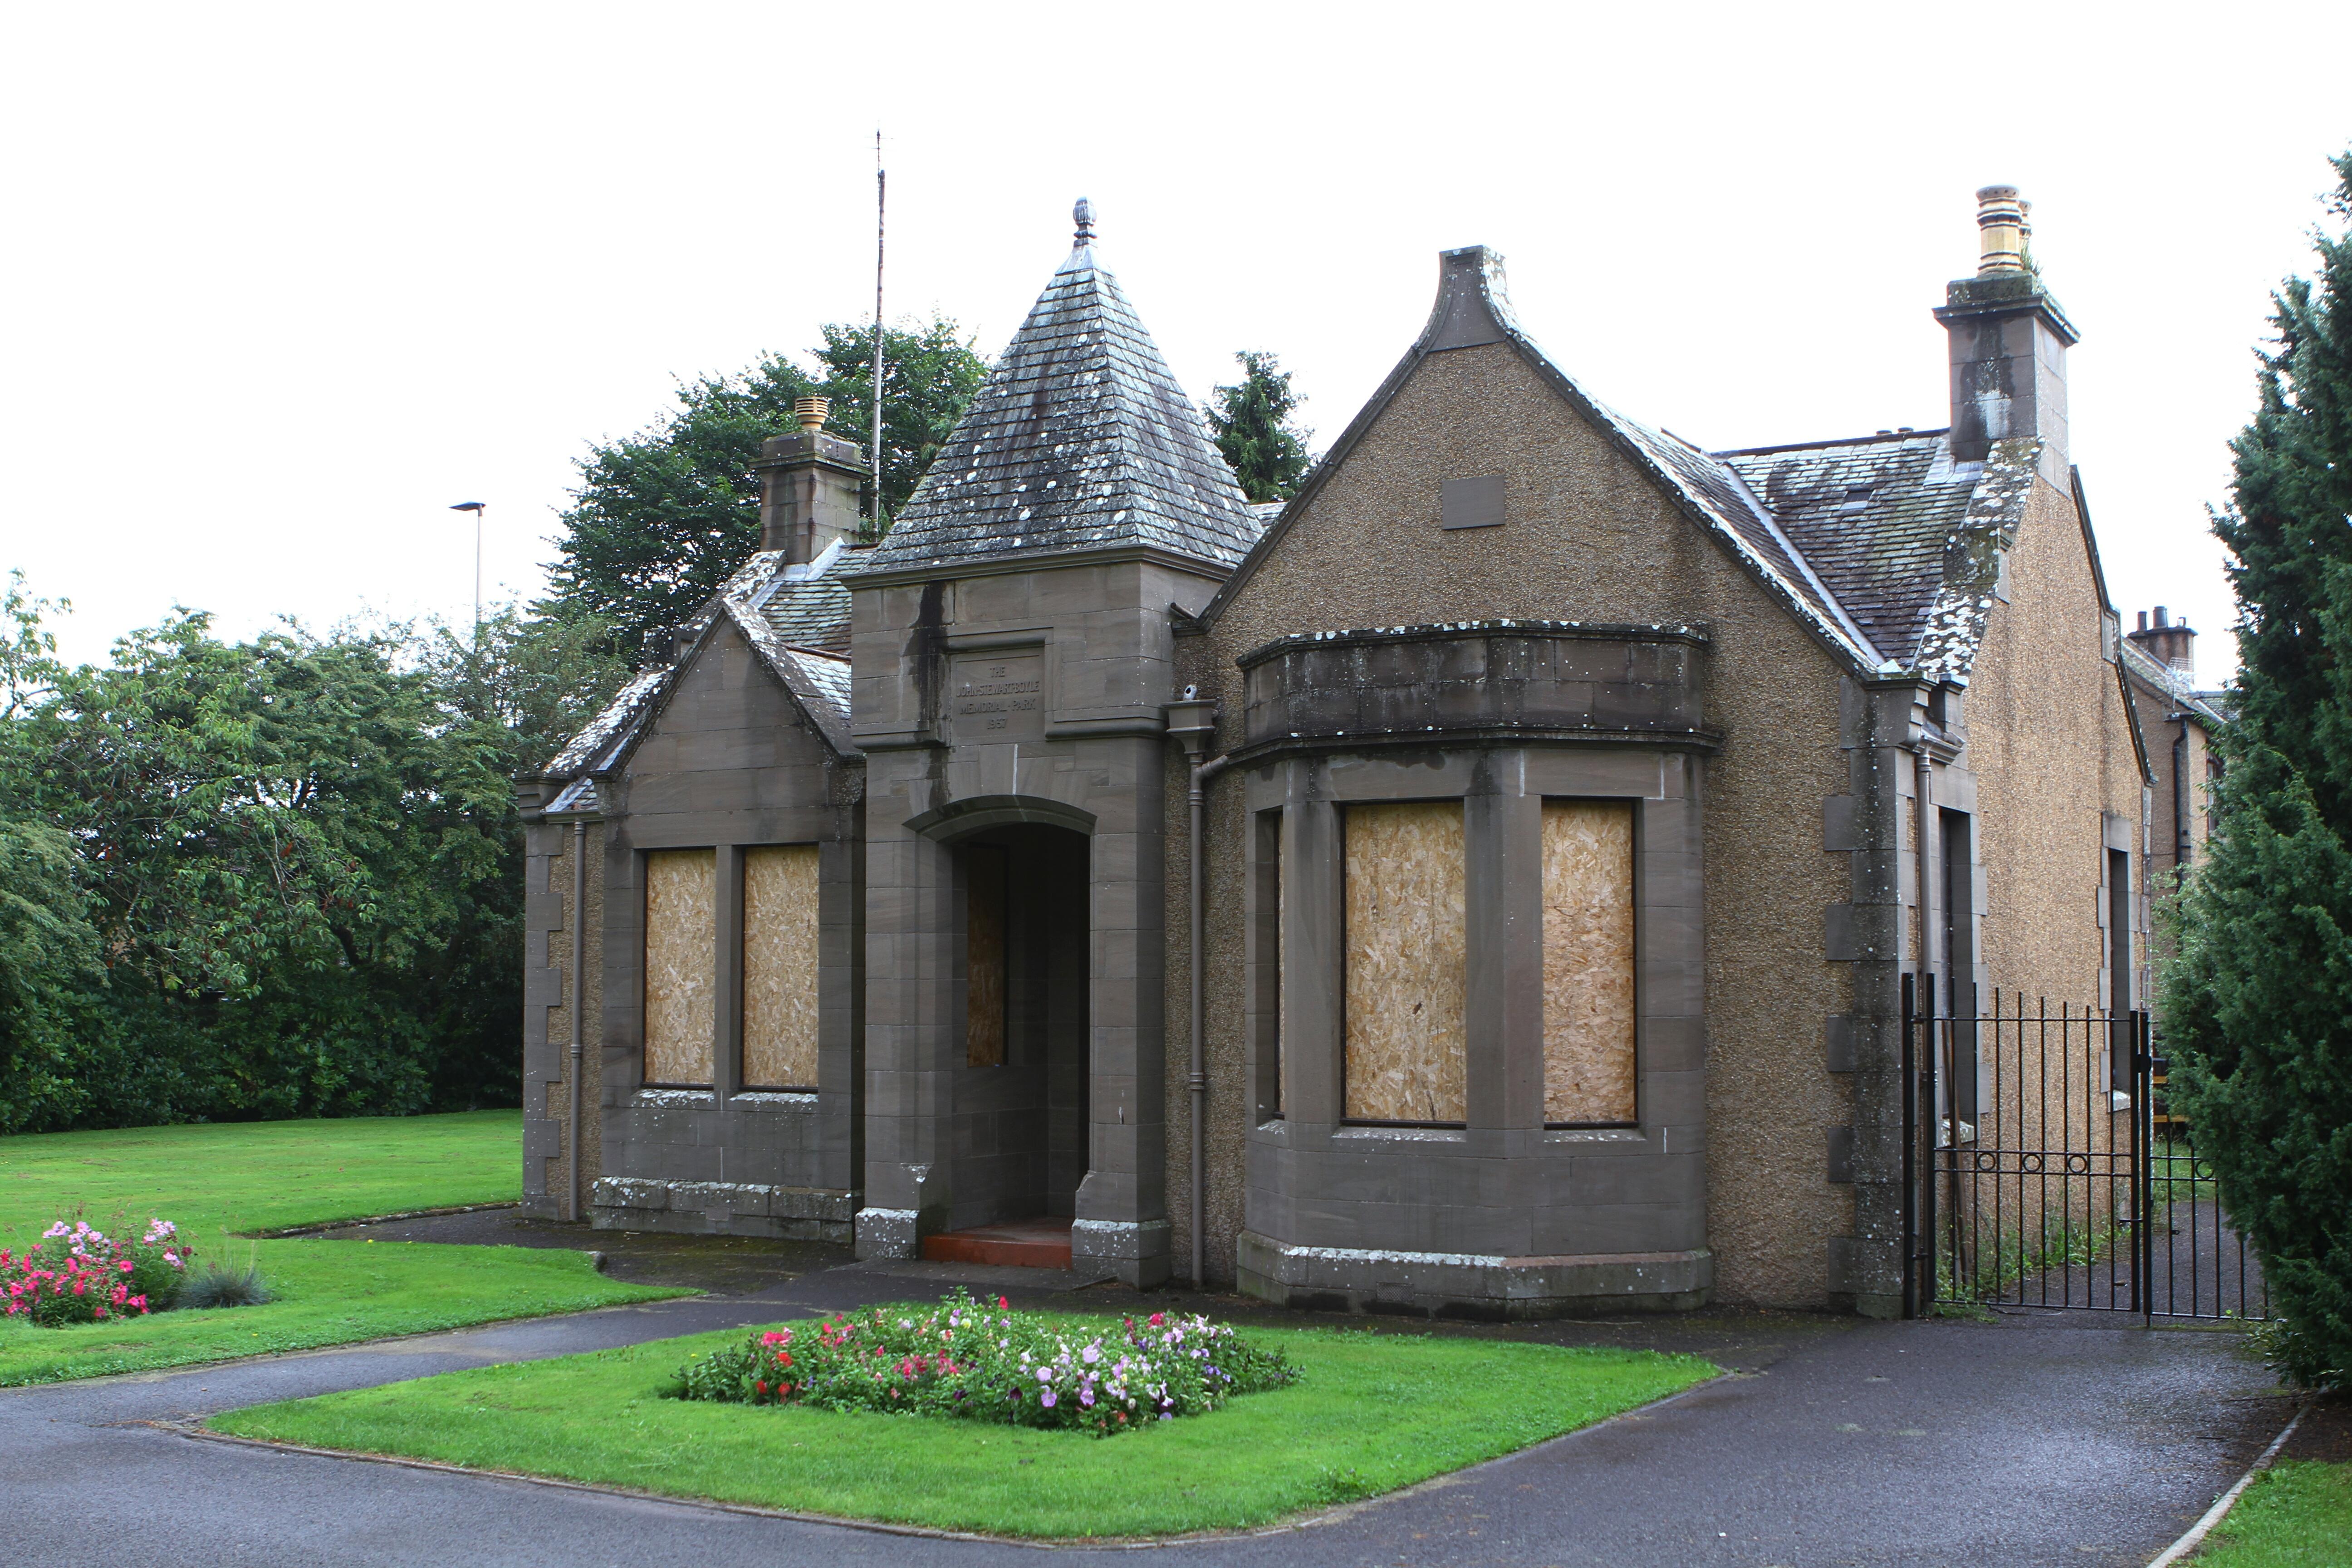 The former park keeper's cottage in Boyle Park, Forfar.